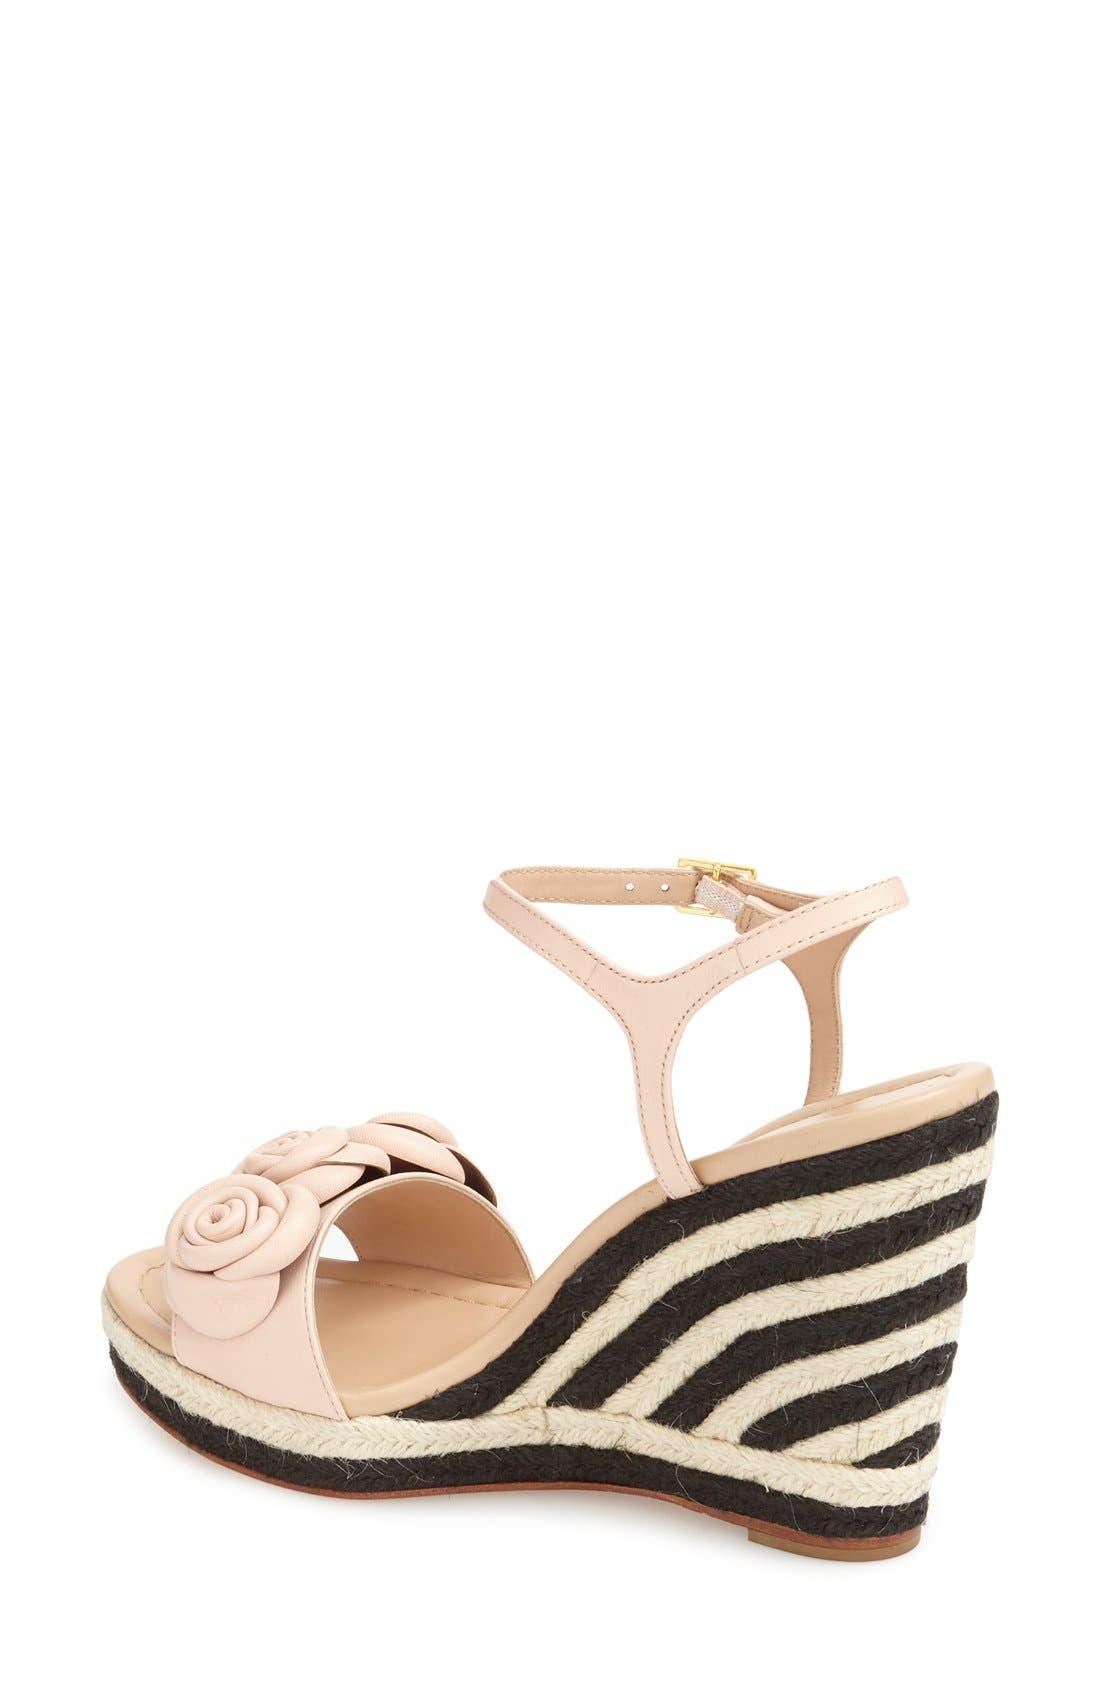 Alternate Image 2  - kate spade new york 'jill' espadrille wedge sandal (Women)